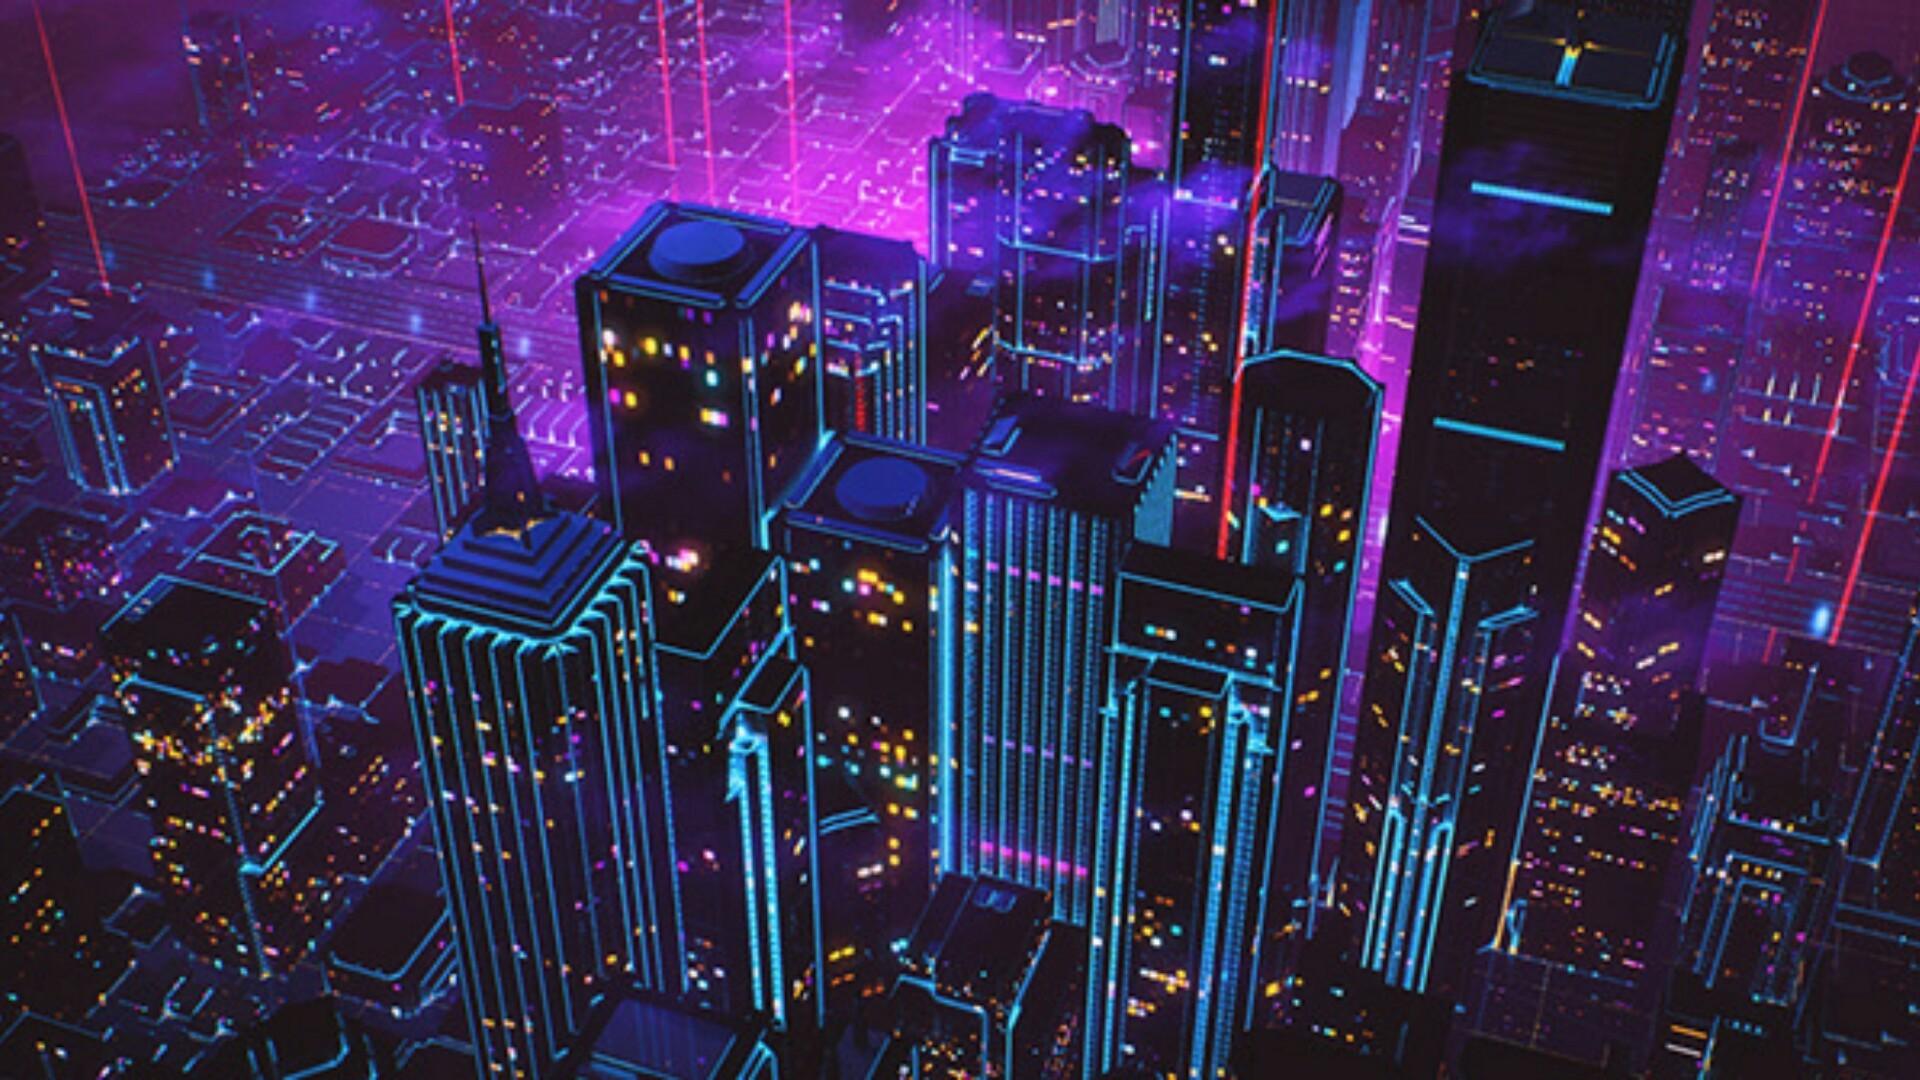 80s style retrowave neon artwork wallpaper